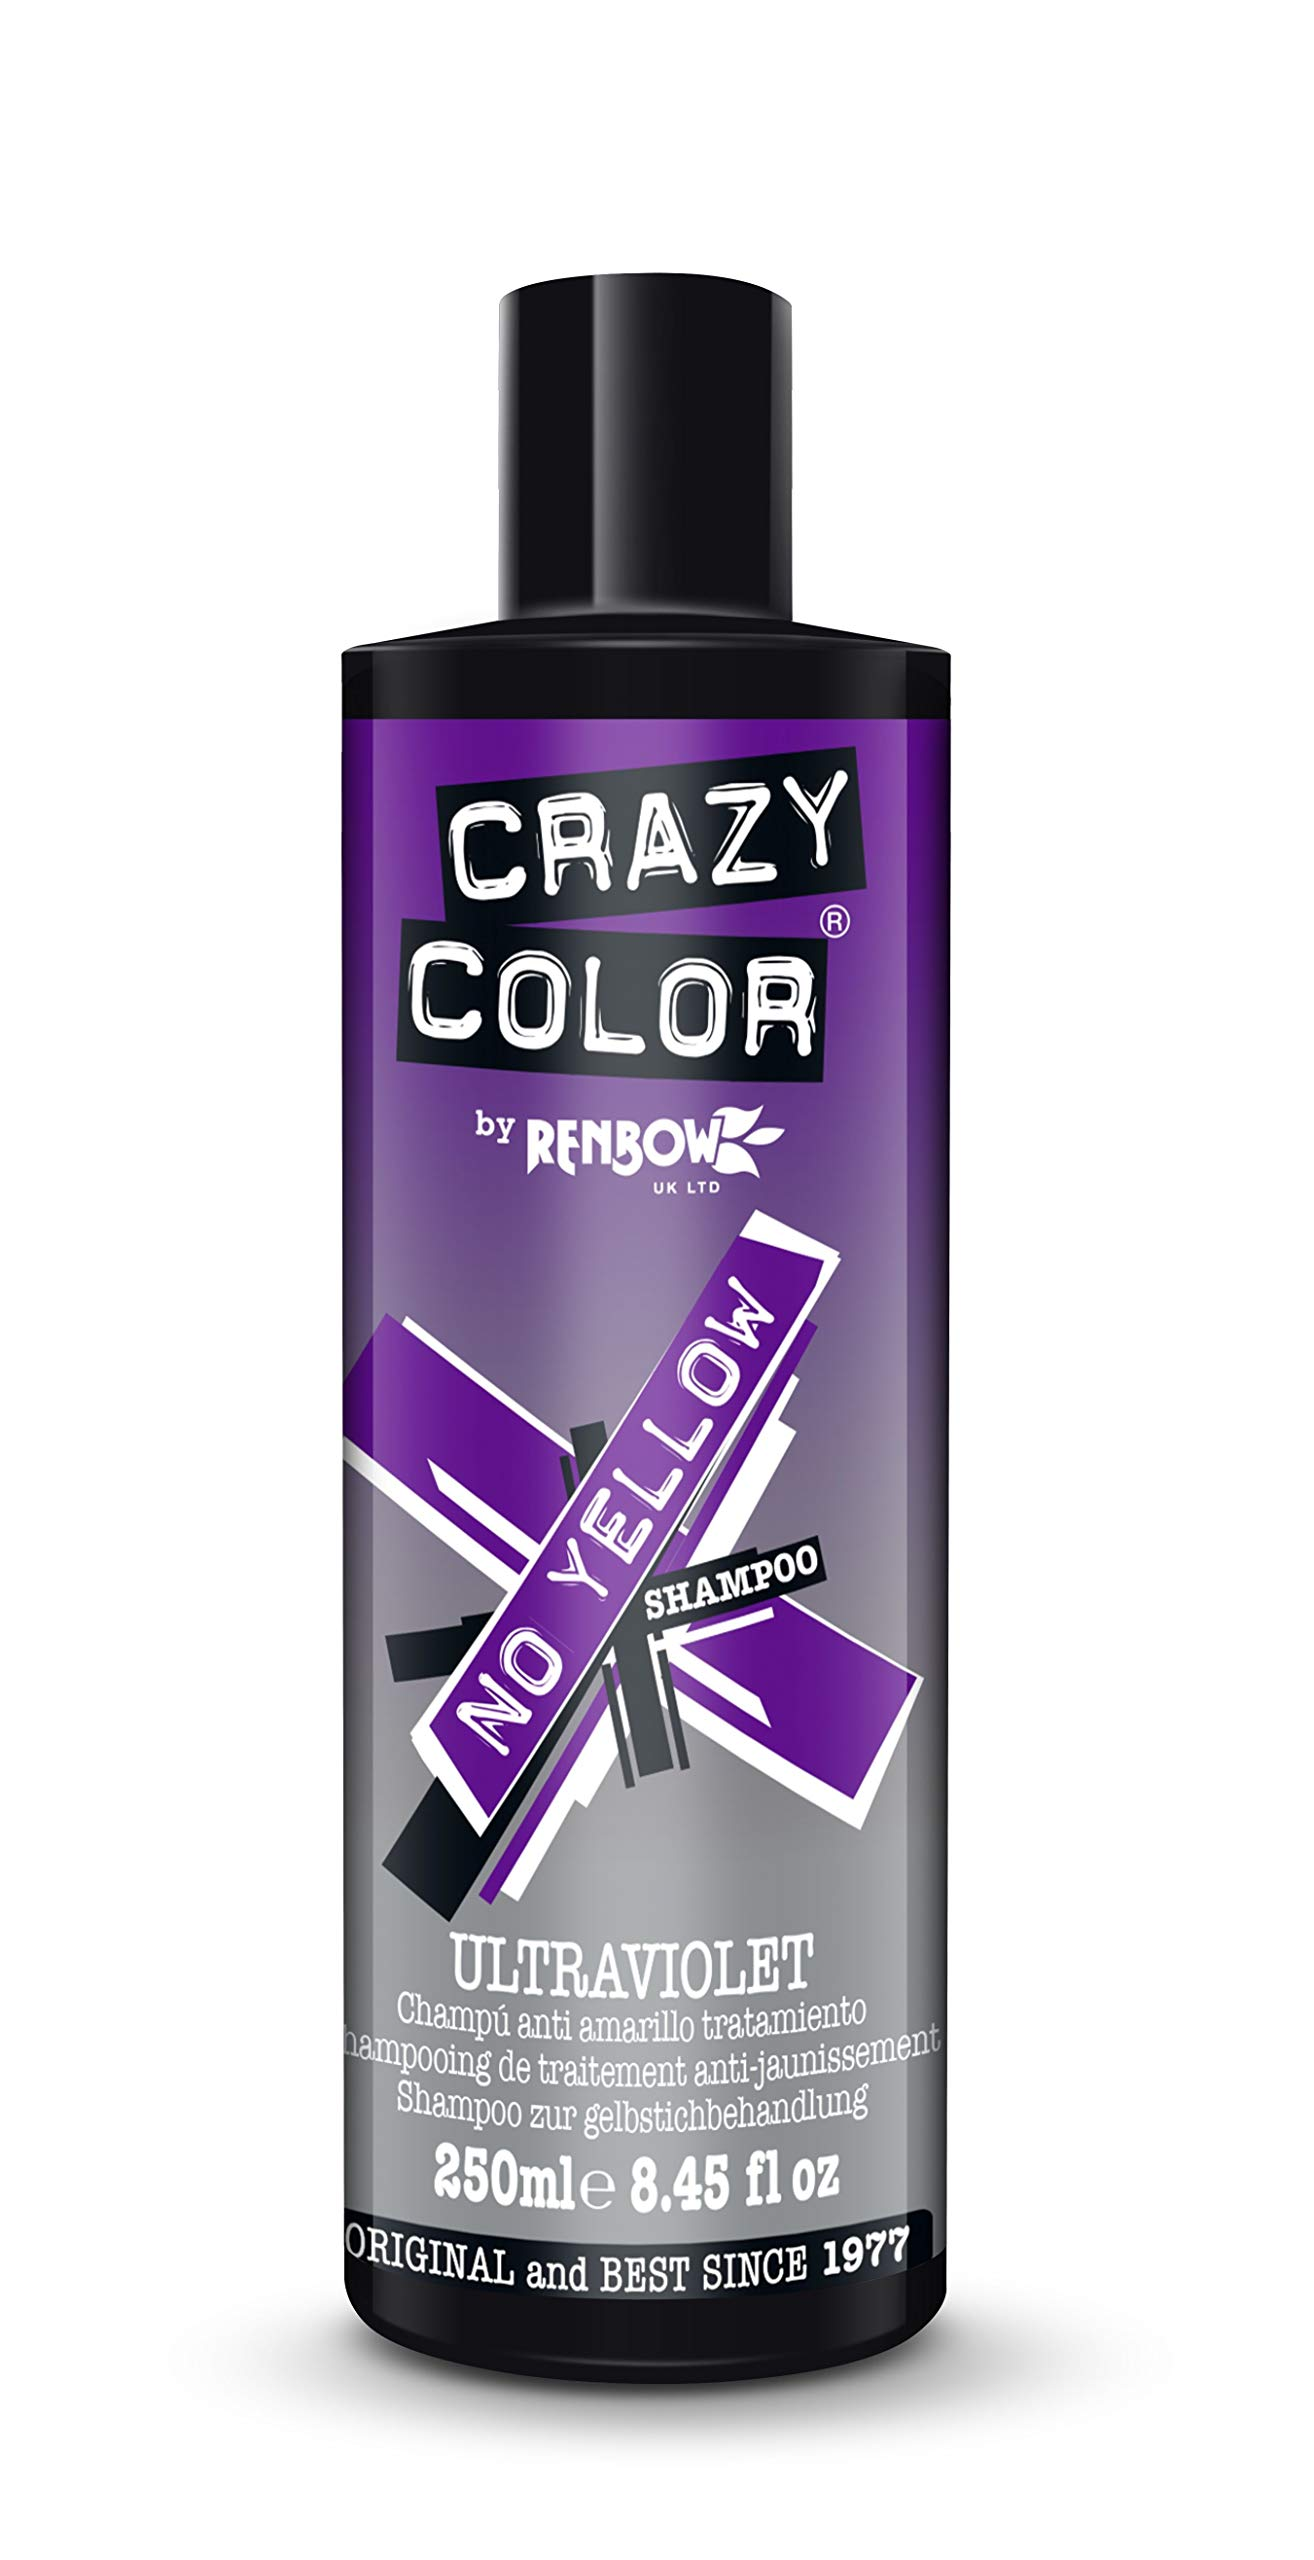 Crazy Color Ultraviolet No Yellow Shampoo - Purple Undertones for Light Blonde Hair - 250ml